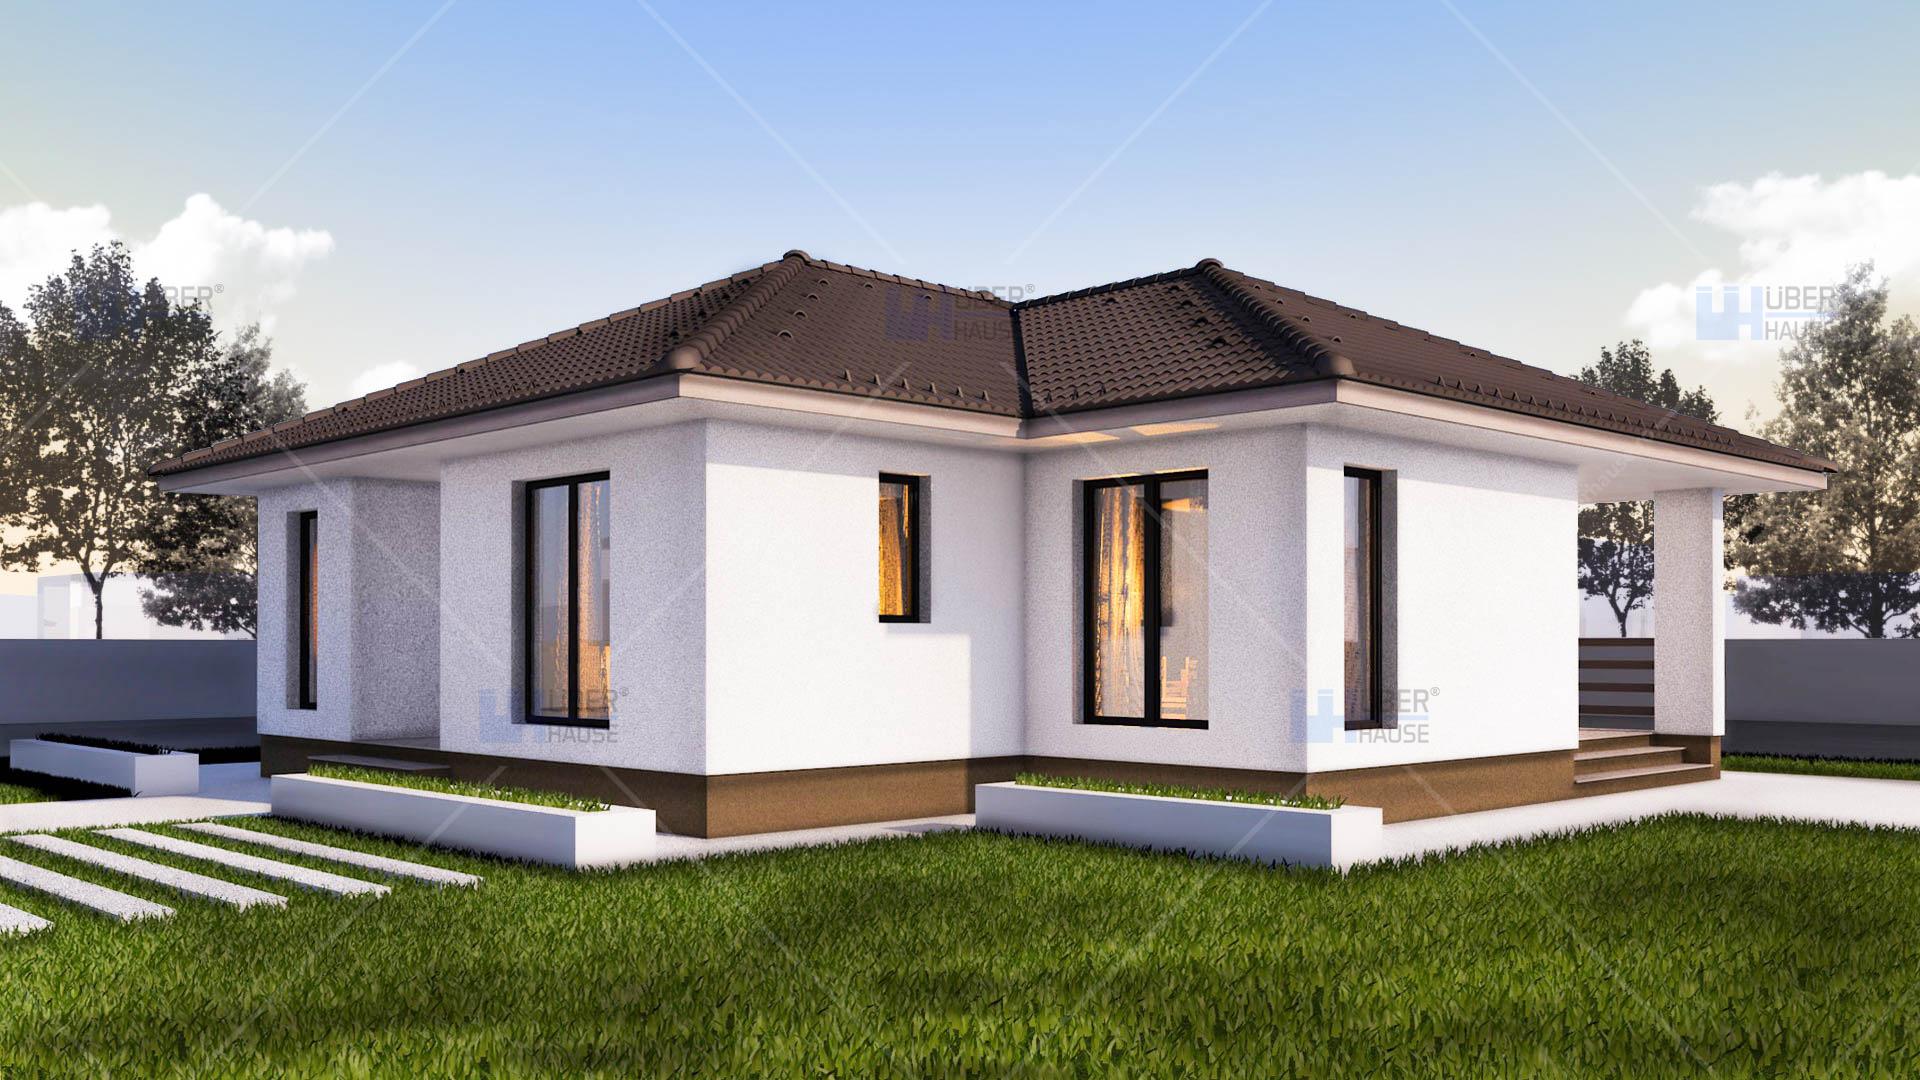 Lucrari proiecte proiect casa mica ema uberhause poza 1 for Proiect casa 100 mp fara etaj